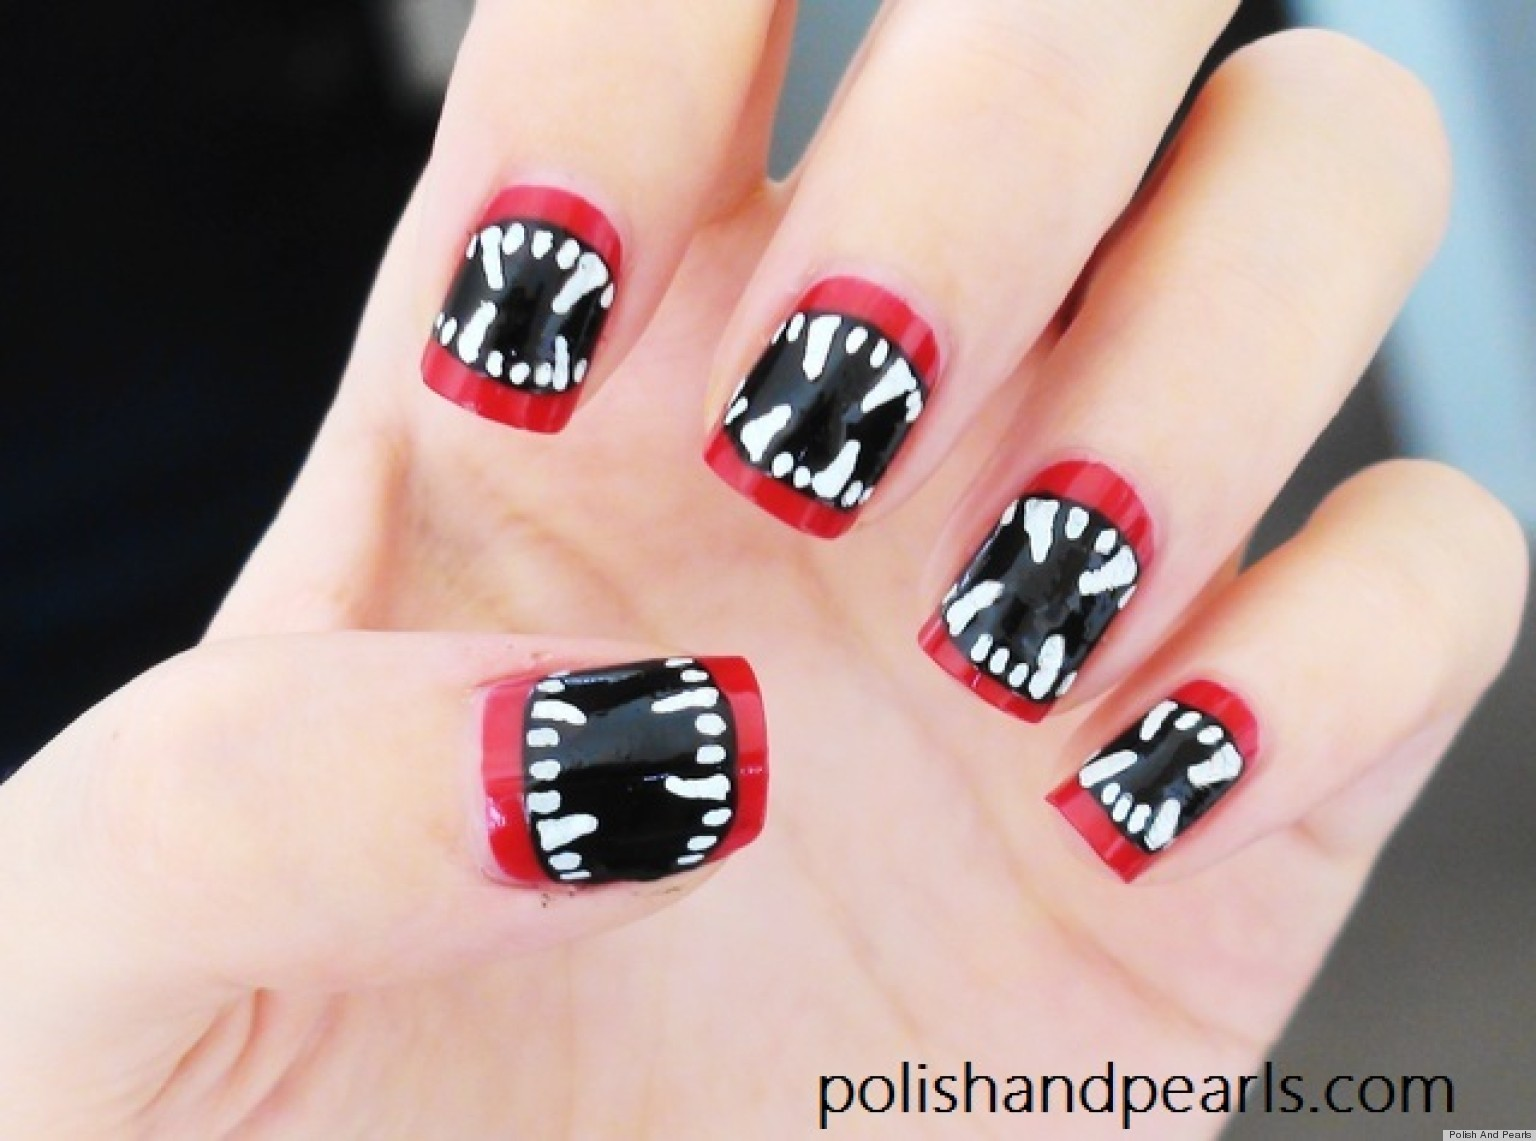 DIY Nail Art: Halloween-Inspired Vampire Fangs Manicure (VIDEO ...